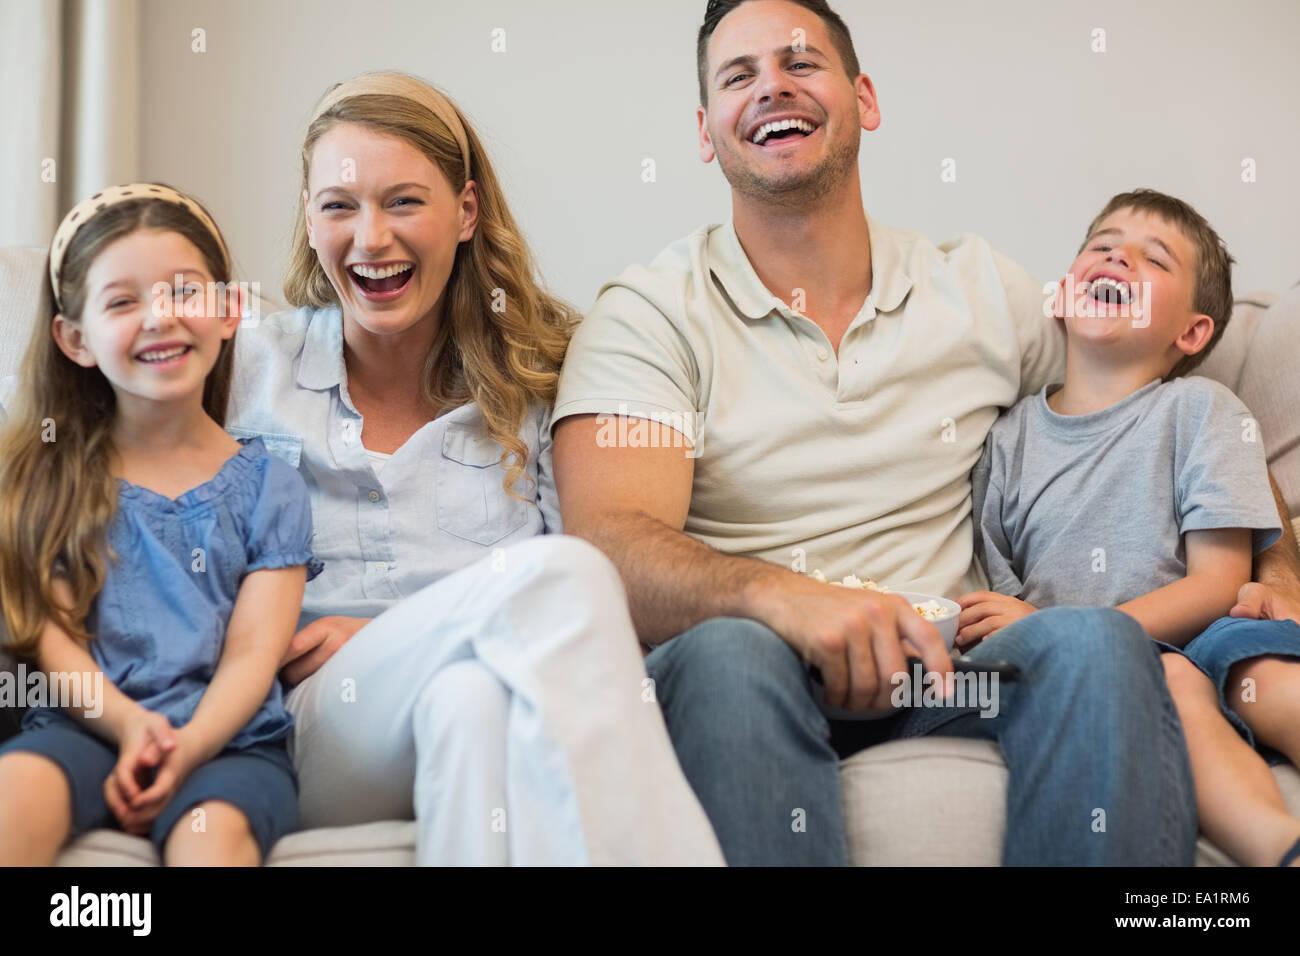 Happy Family sitting on sofa Photo Stock